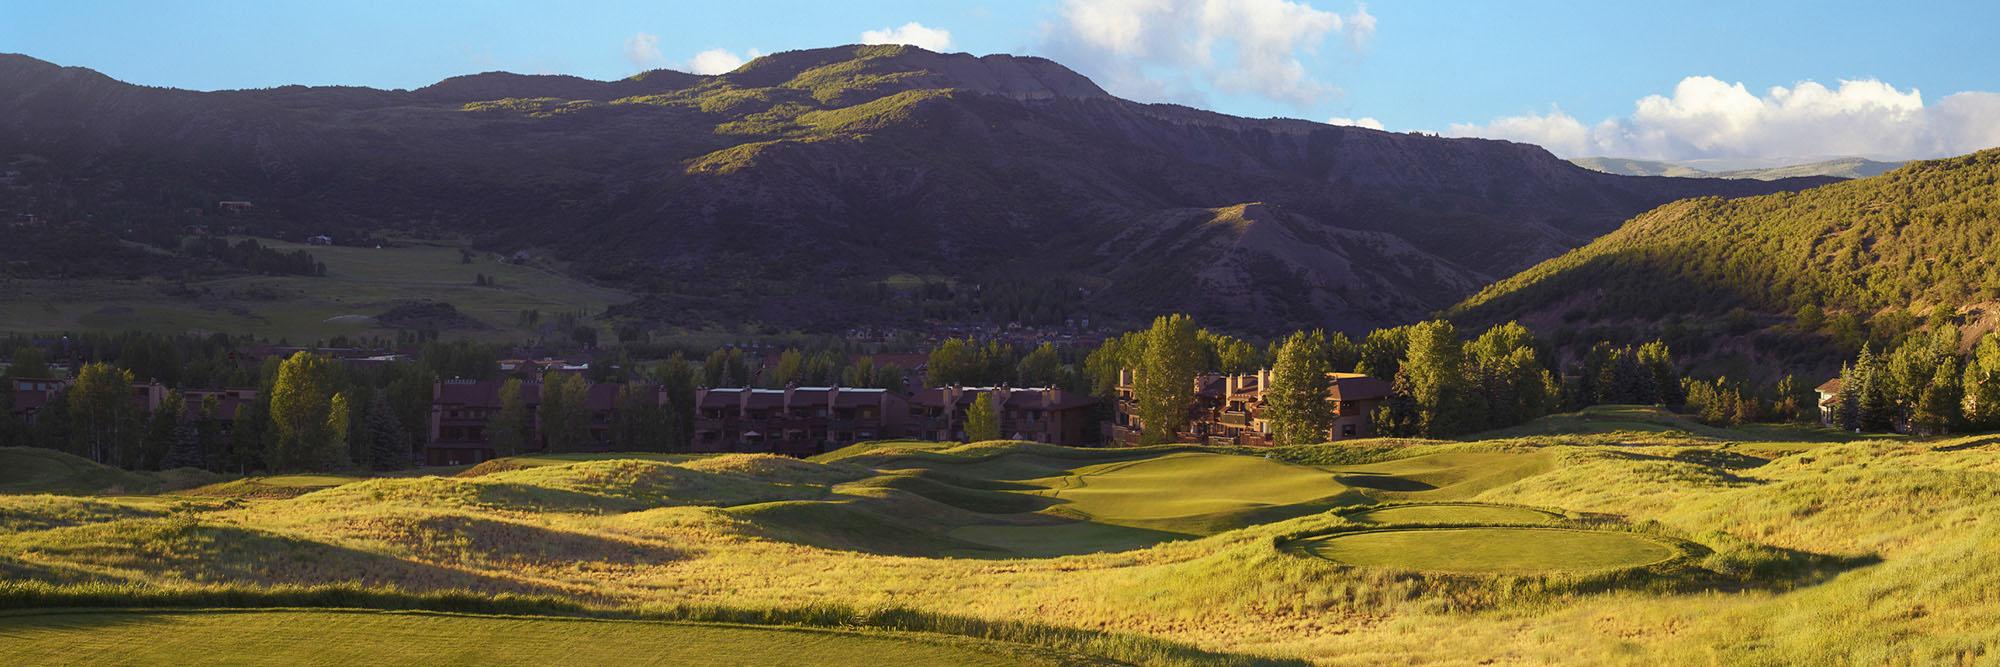 Golf Course Image - Snowmass No. 6